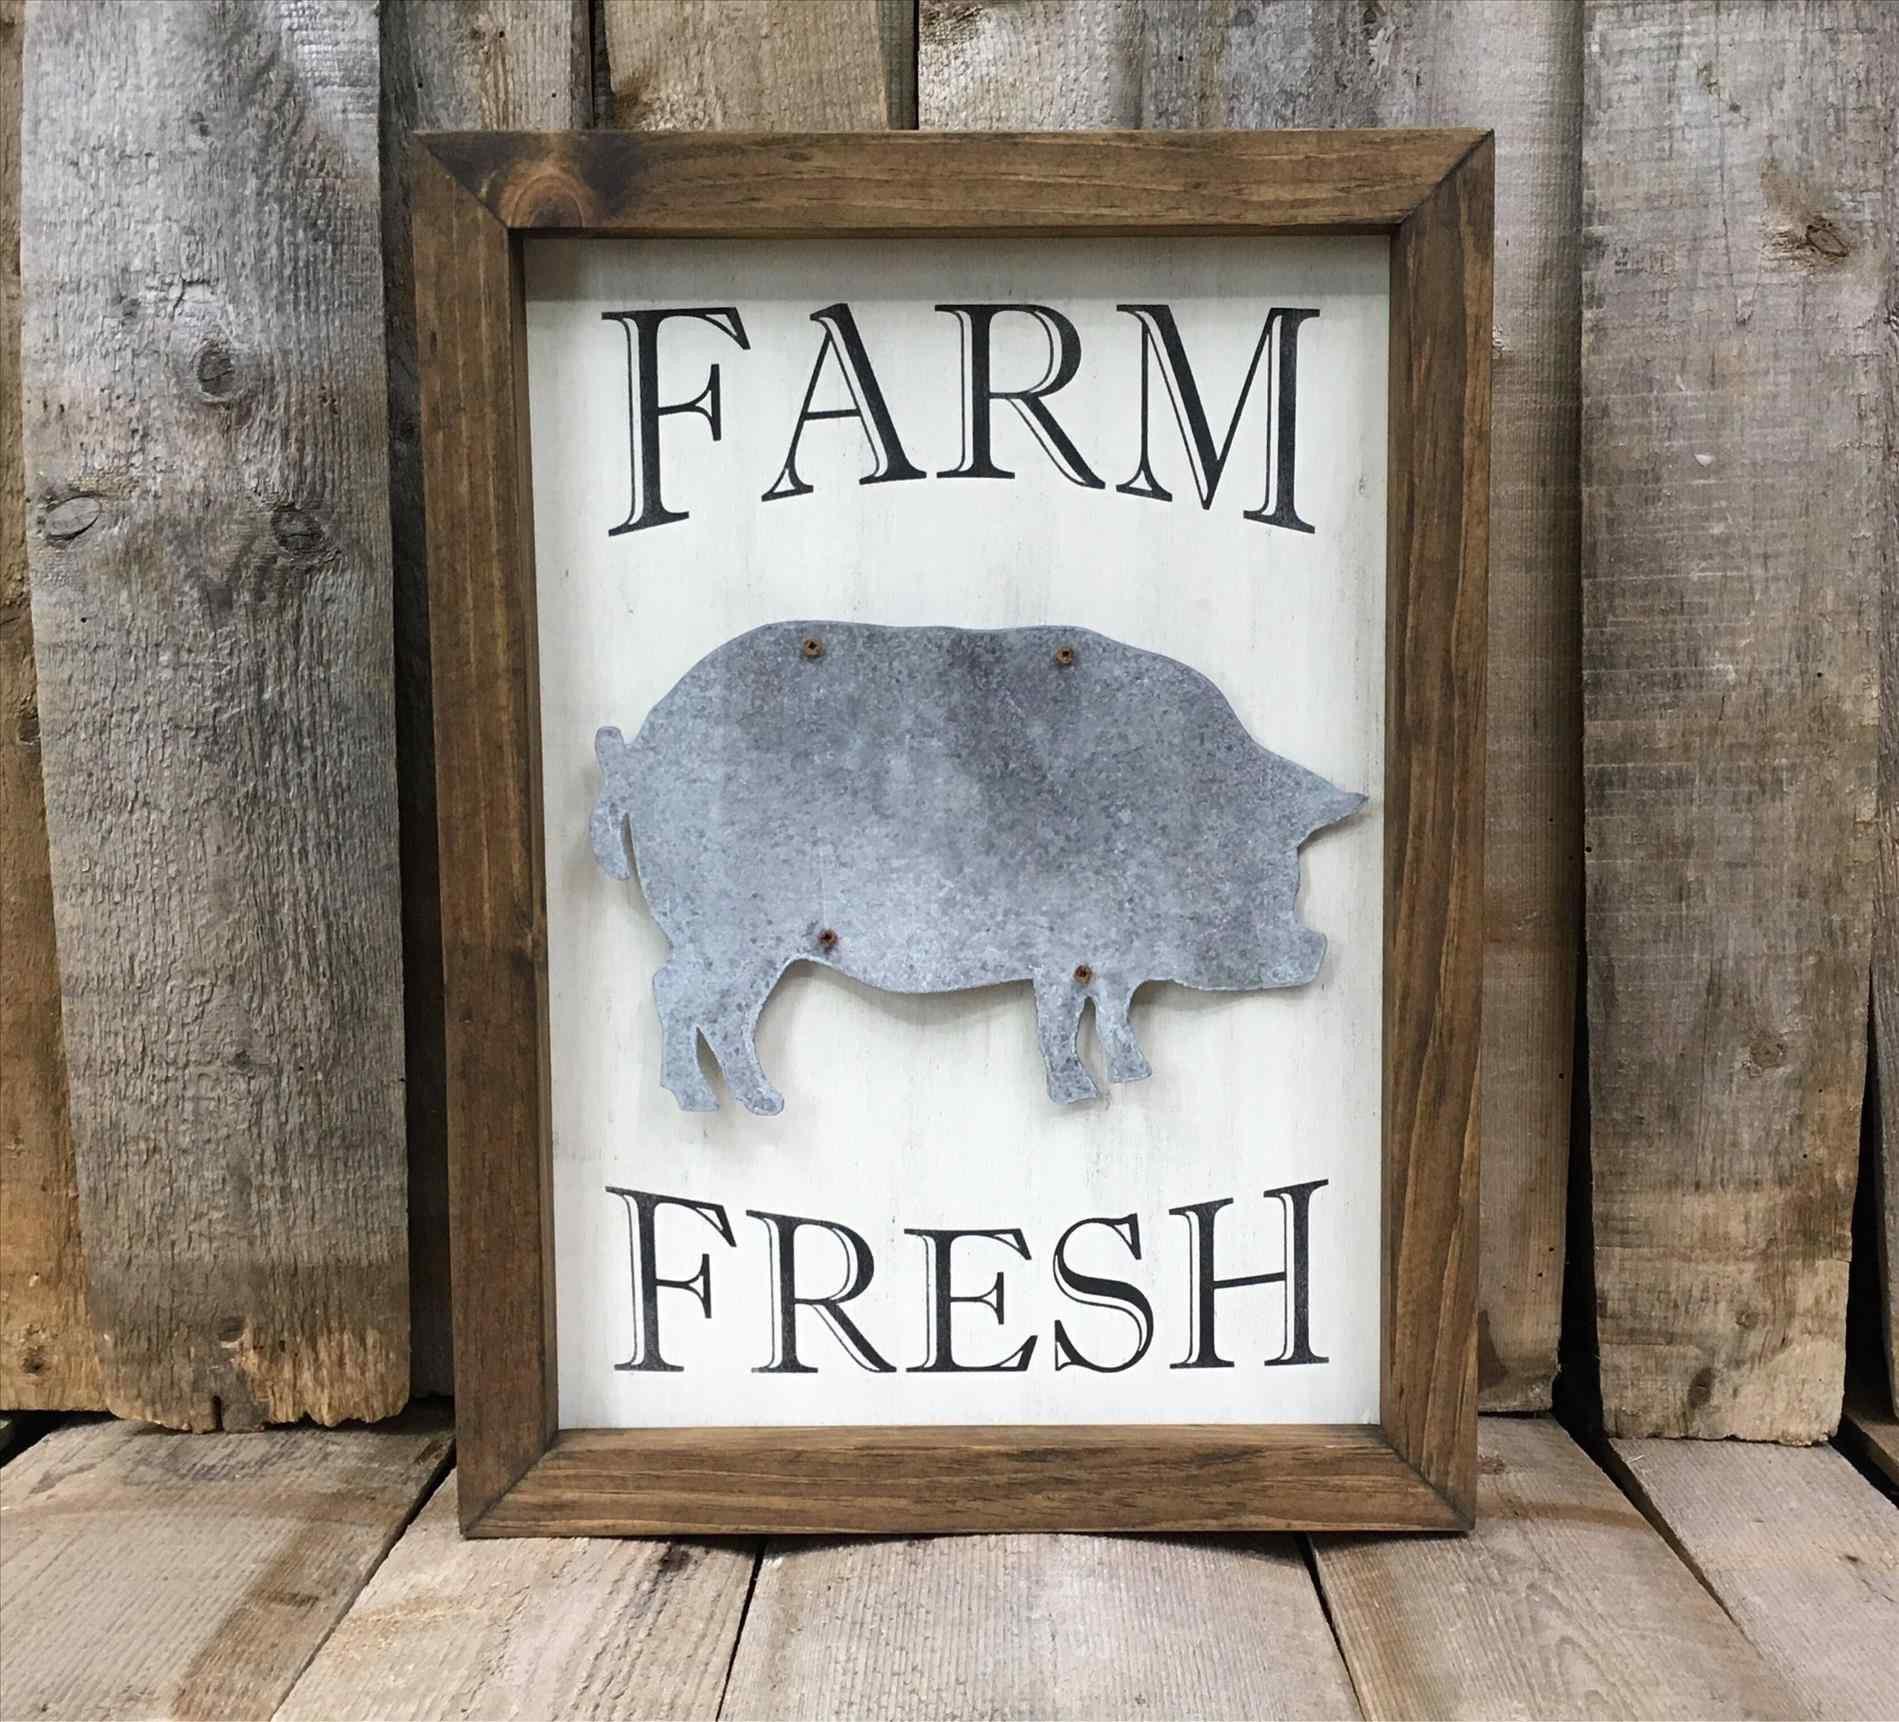 Best ideas about Farm Animal Kitchen Decor . Save or Pin Farm Animal Kitchen Decor Now.